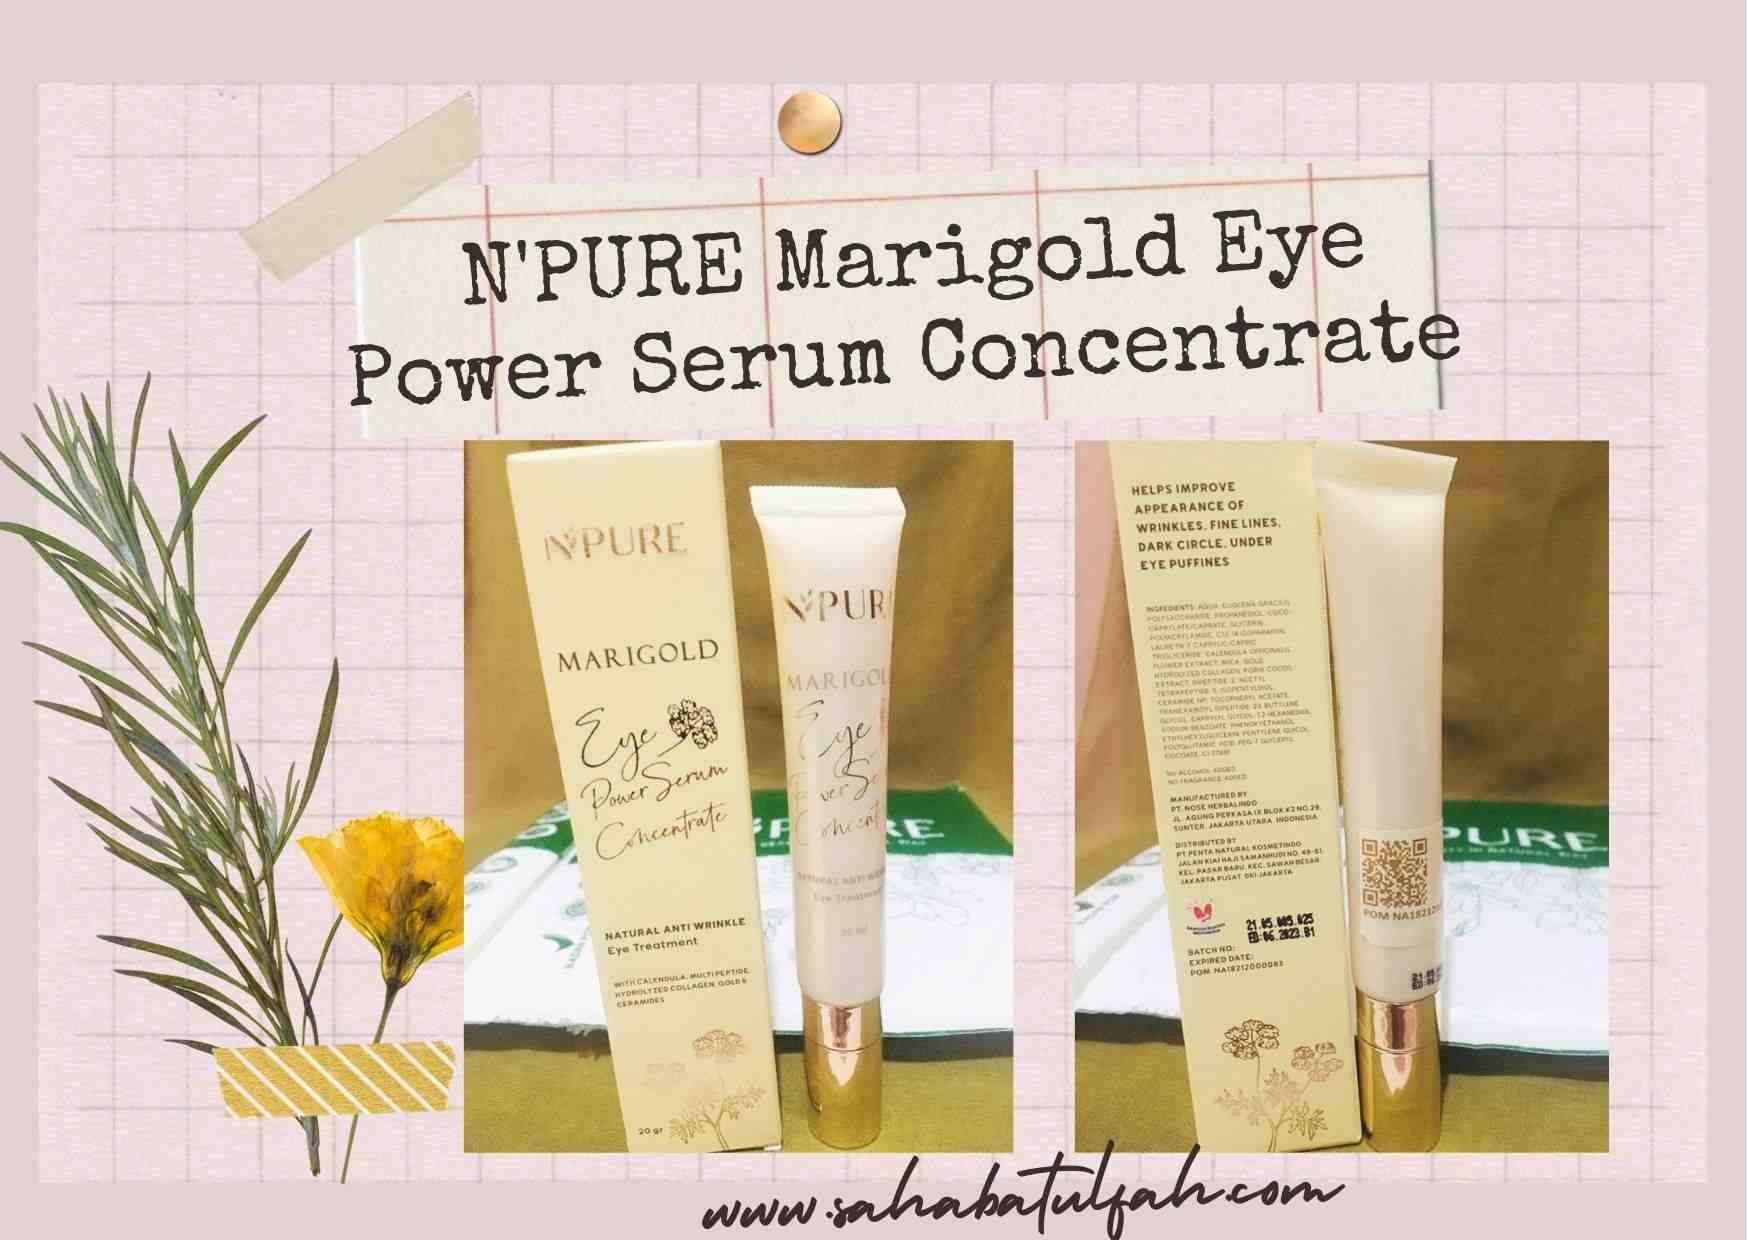 N'PURE-Marigold-Eye-Power-Serum